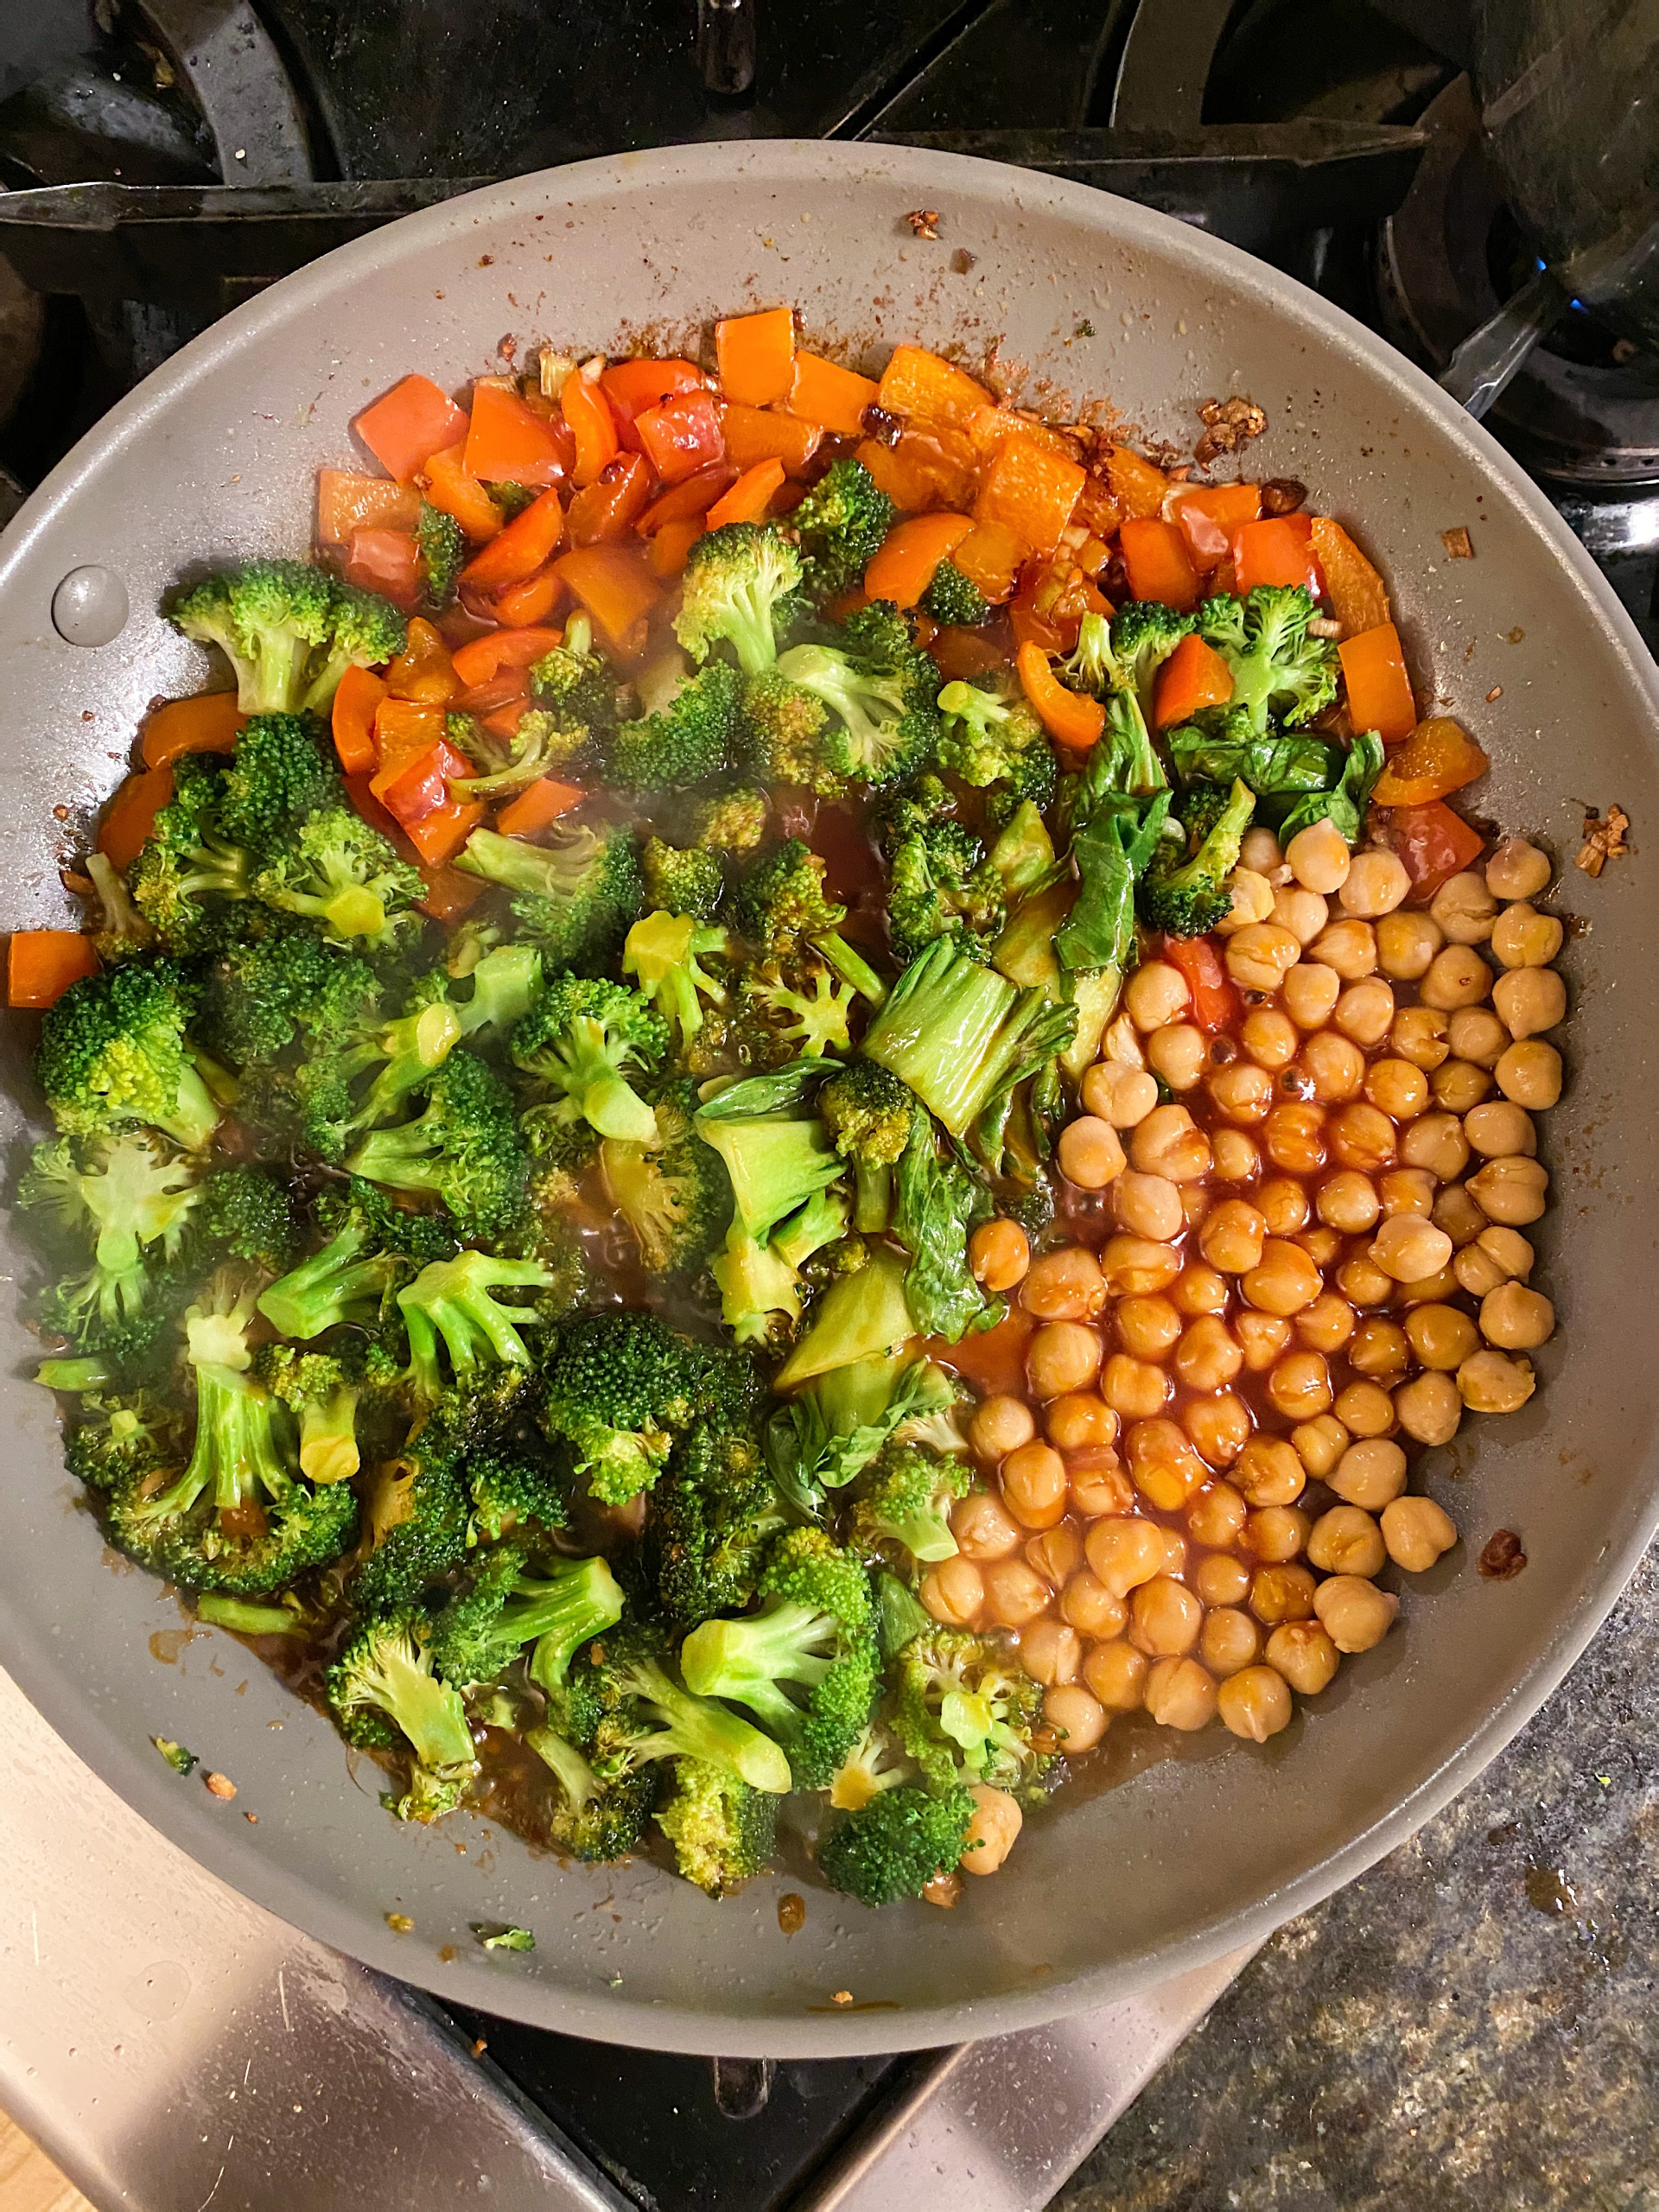 General Tso's Chickpeas & Veggies #glutenfreerecipes www.healthygffamily.com